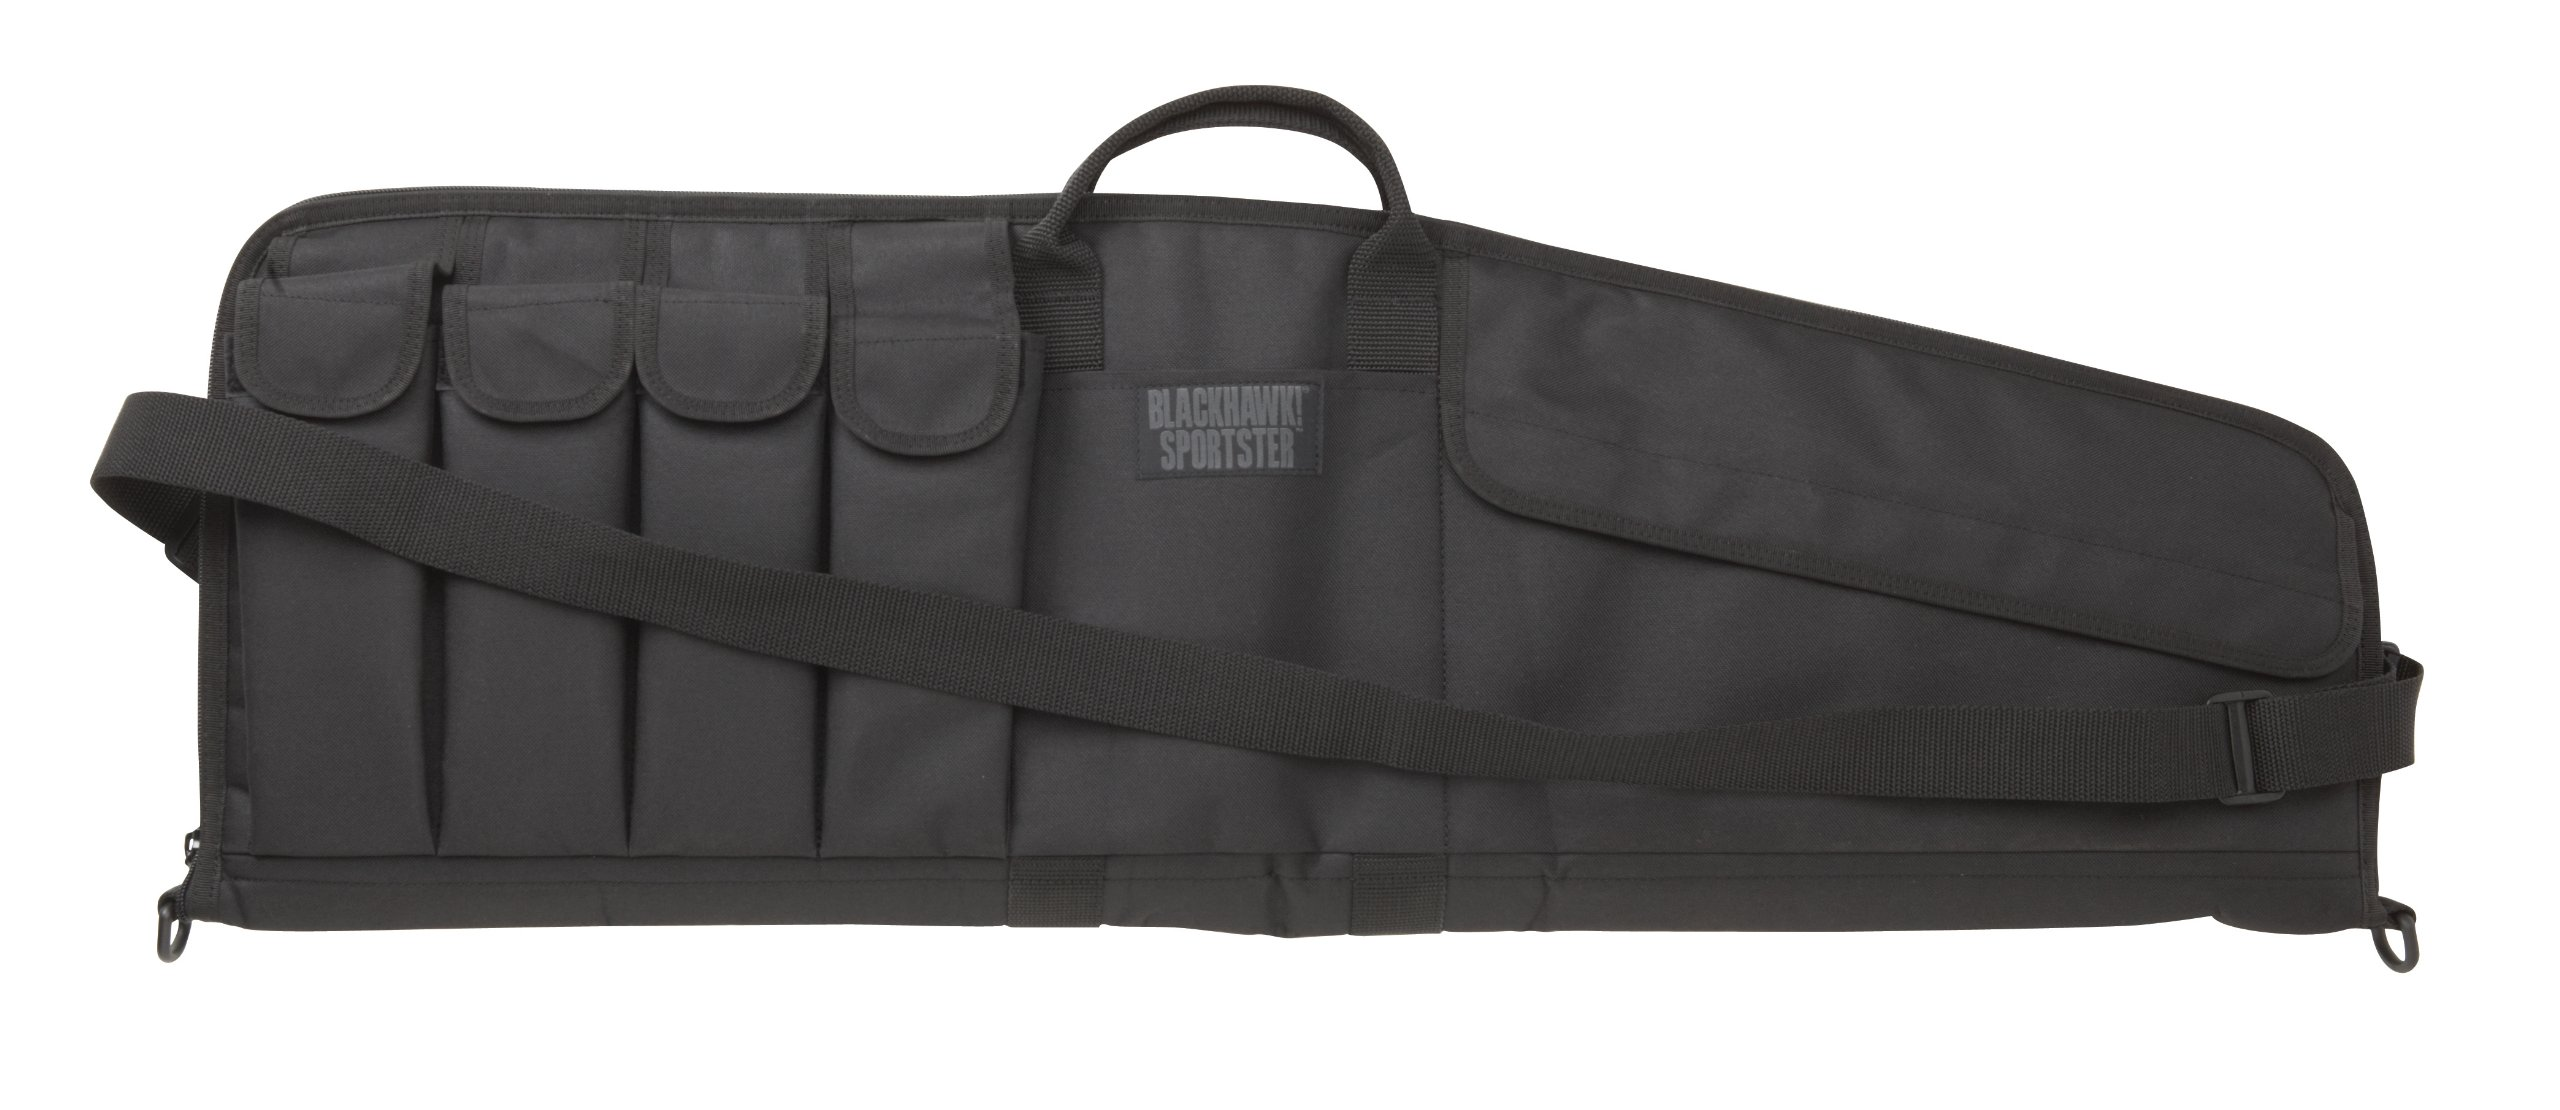 BLACKHAWK! Sport Tact Carbine Gun Case, 36-Inch